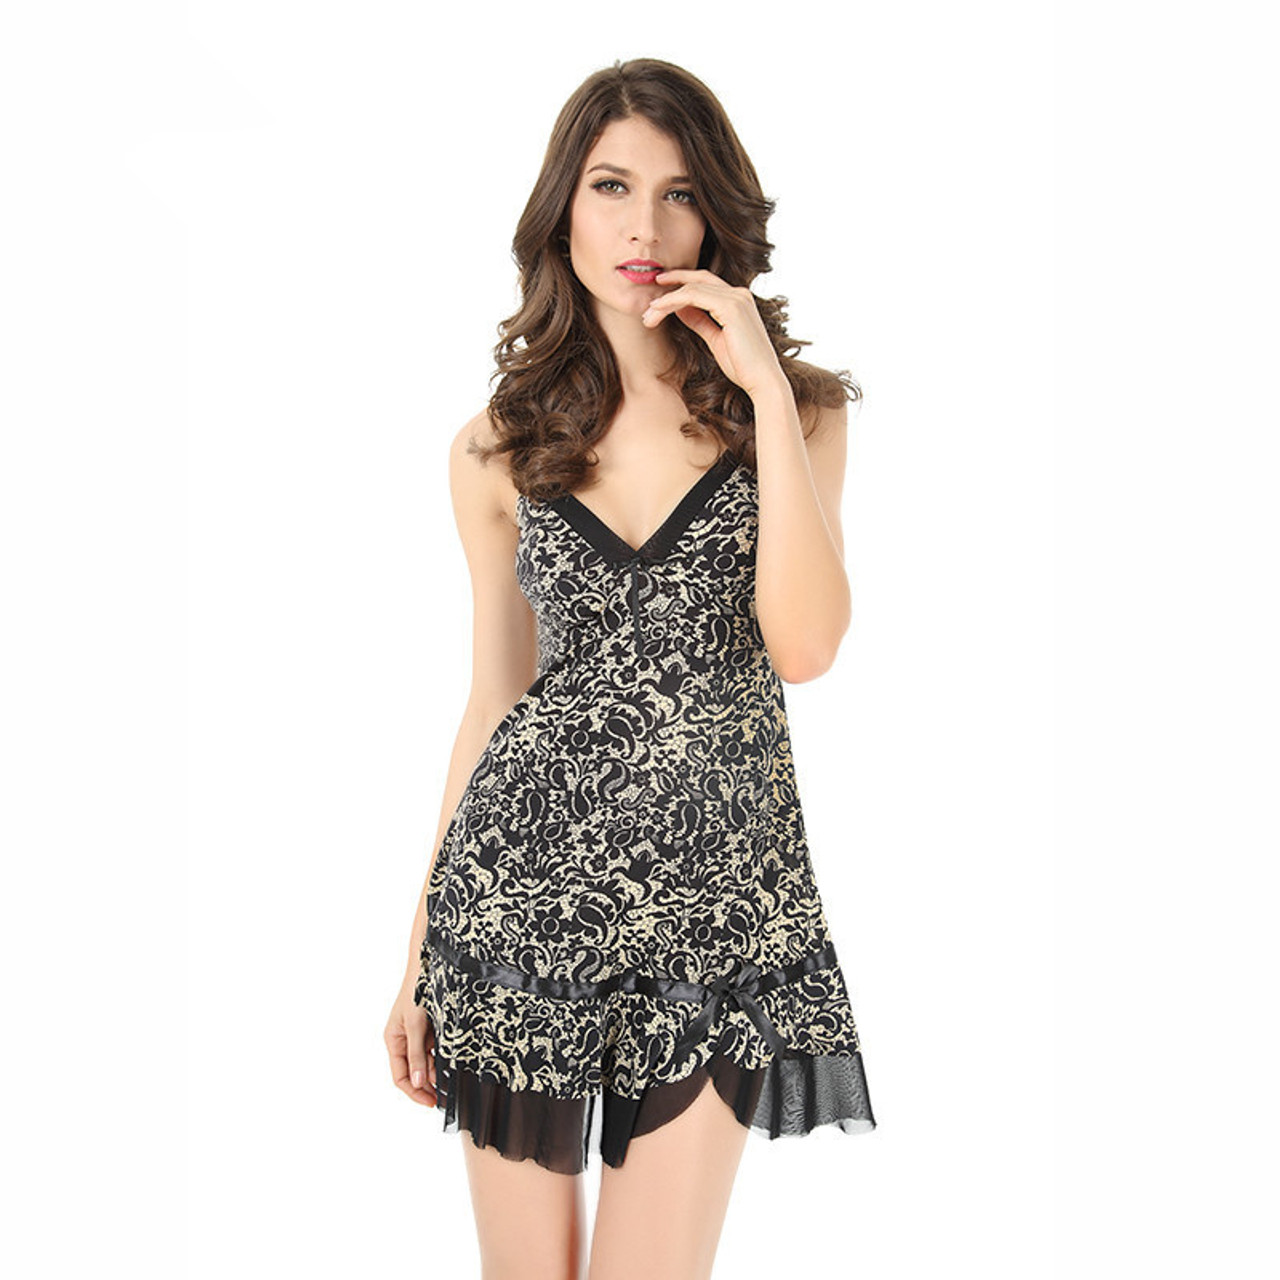 cf6e1f2949 ... JiaHuiGe Faux Silk Fashion Sexy Women Nightgown Summer Sleepwears  Sleeveless Dresses Women Size Sexy Sleepwear Nightgown ...